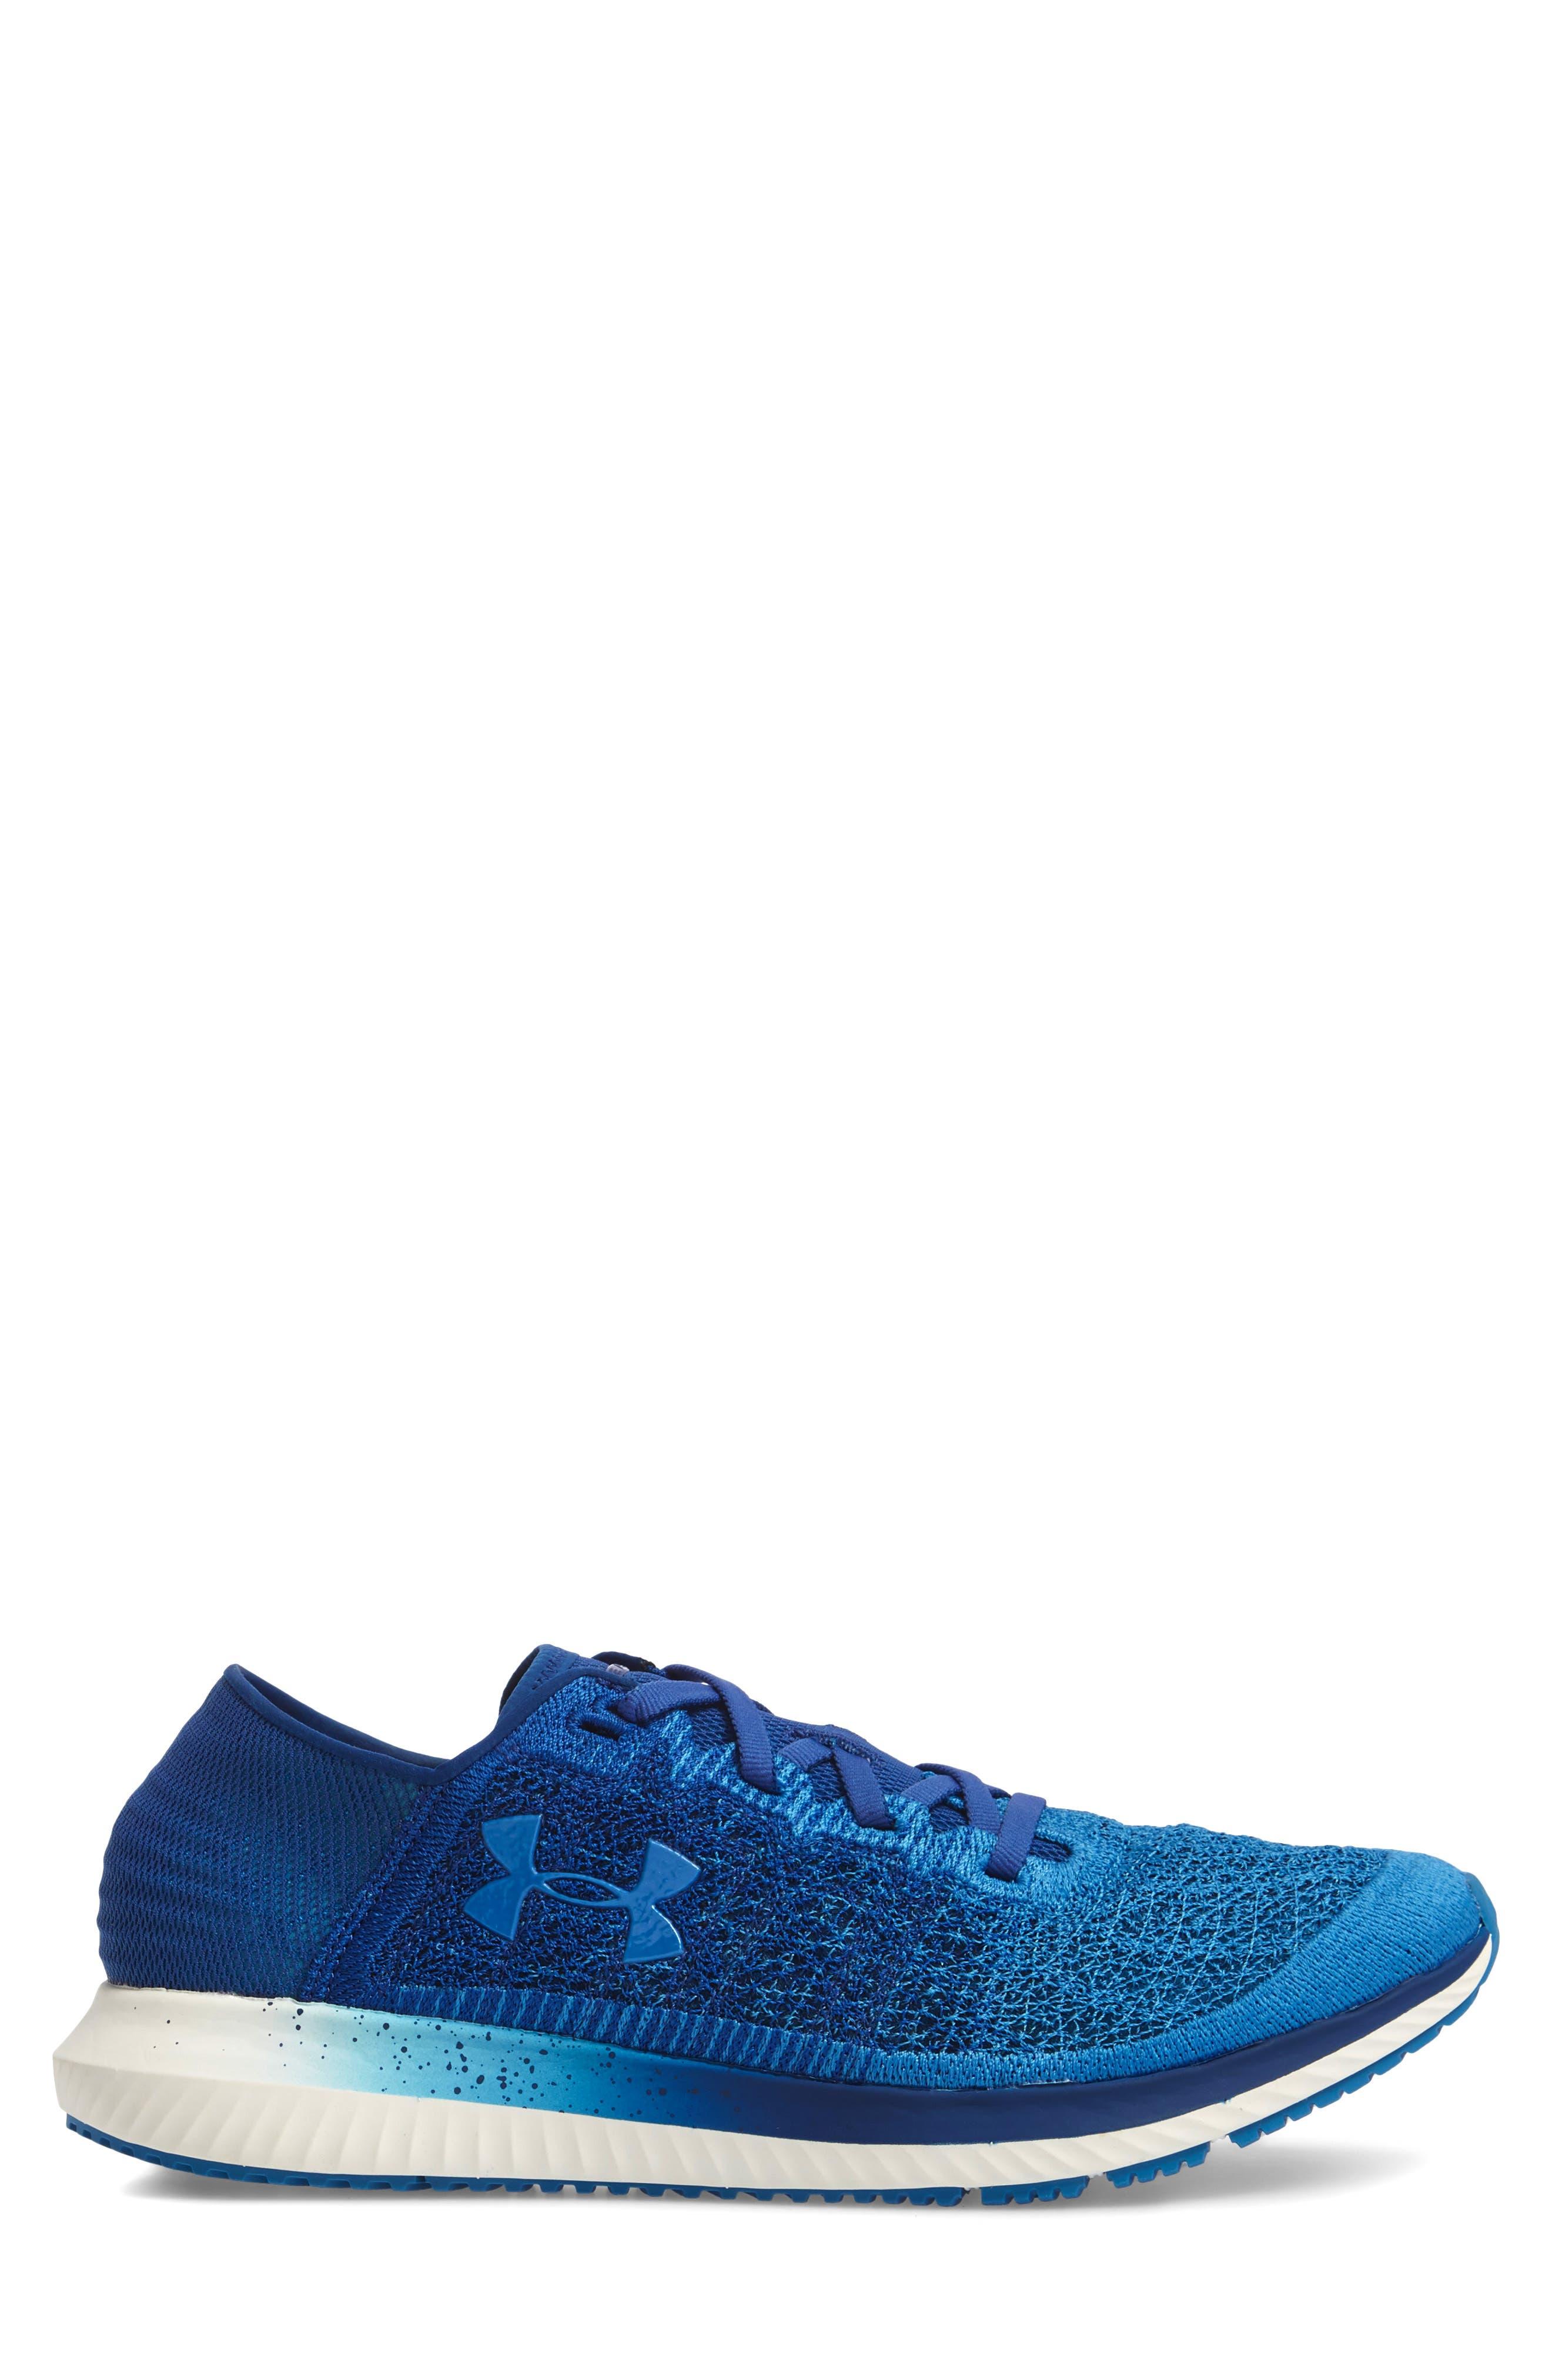 UNDER ARMOUR,                             Threadborne Blur Running Shoe,                             Alternate thumbnail 3, color,                             400